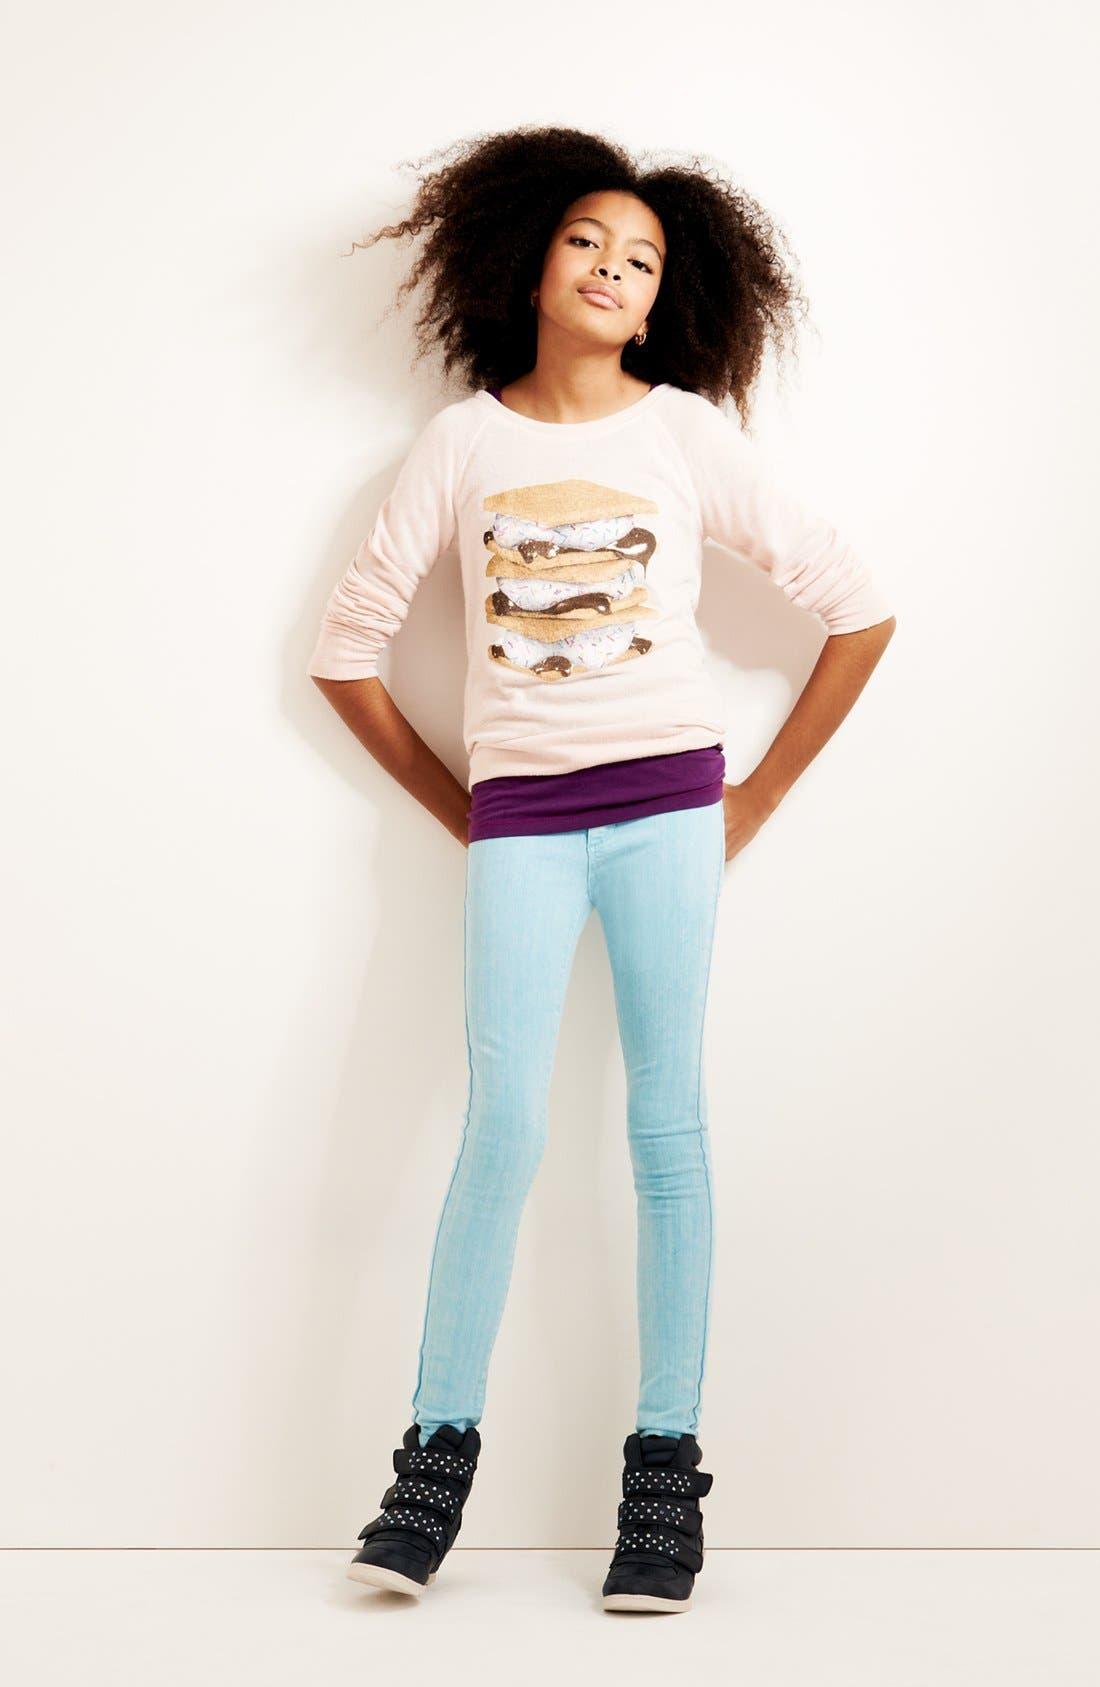 Main Image - Ten Sixty Sherman Graphic Sweatshirt, Tucker + Tate Tank Top & Joe's Jeggings (Big Girls)